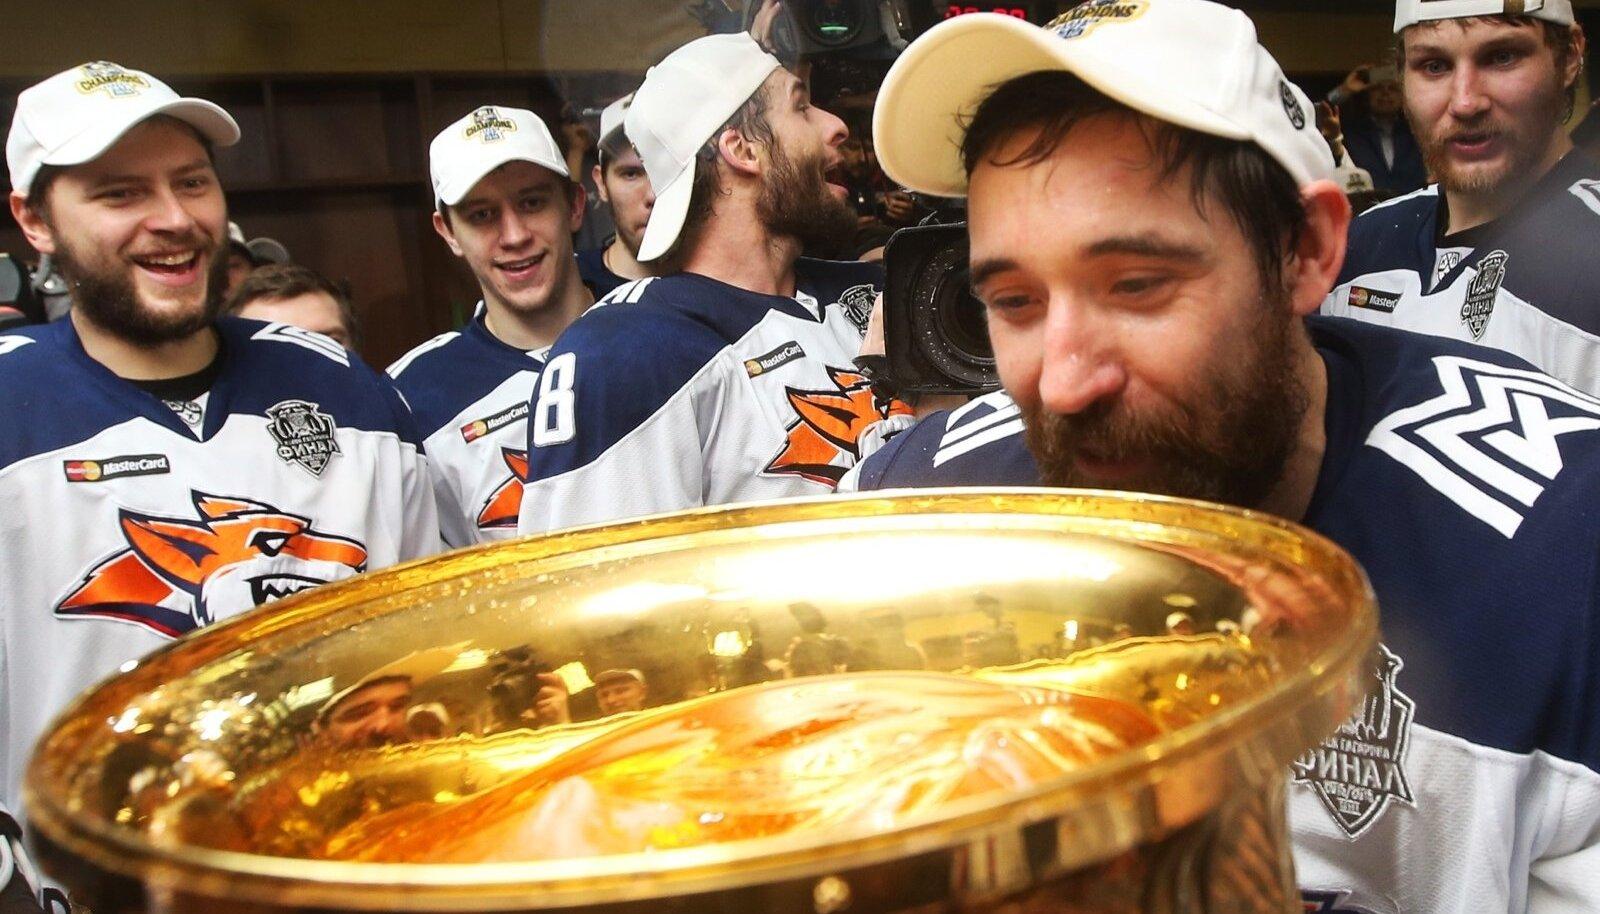 HC Metallurg Magnitogorsk wins 2016 KHL Gagarin Cup